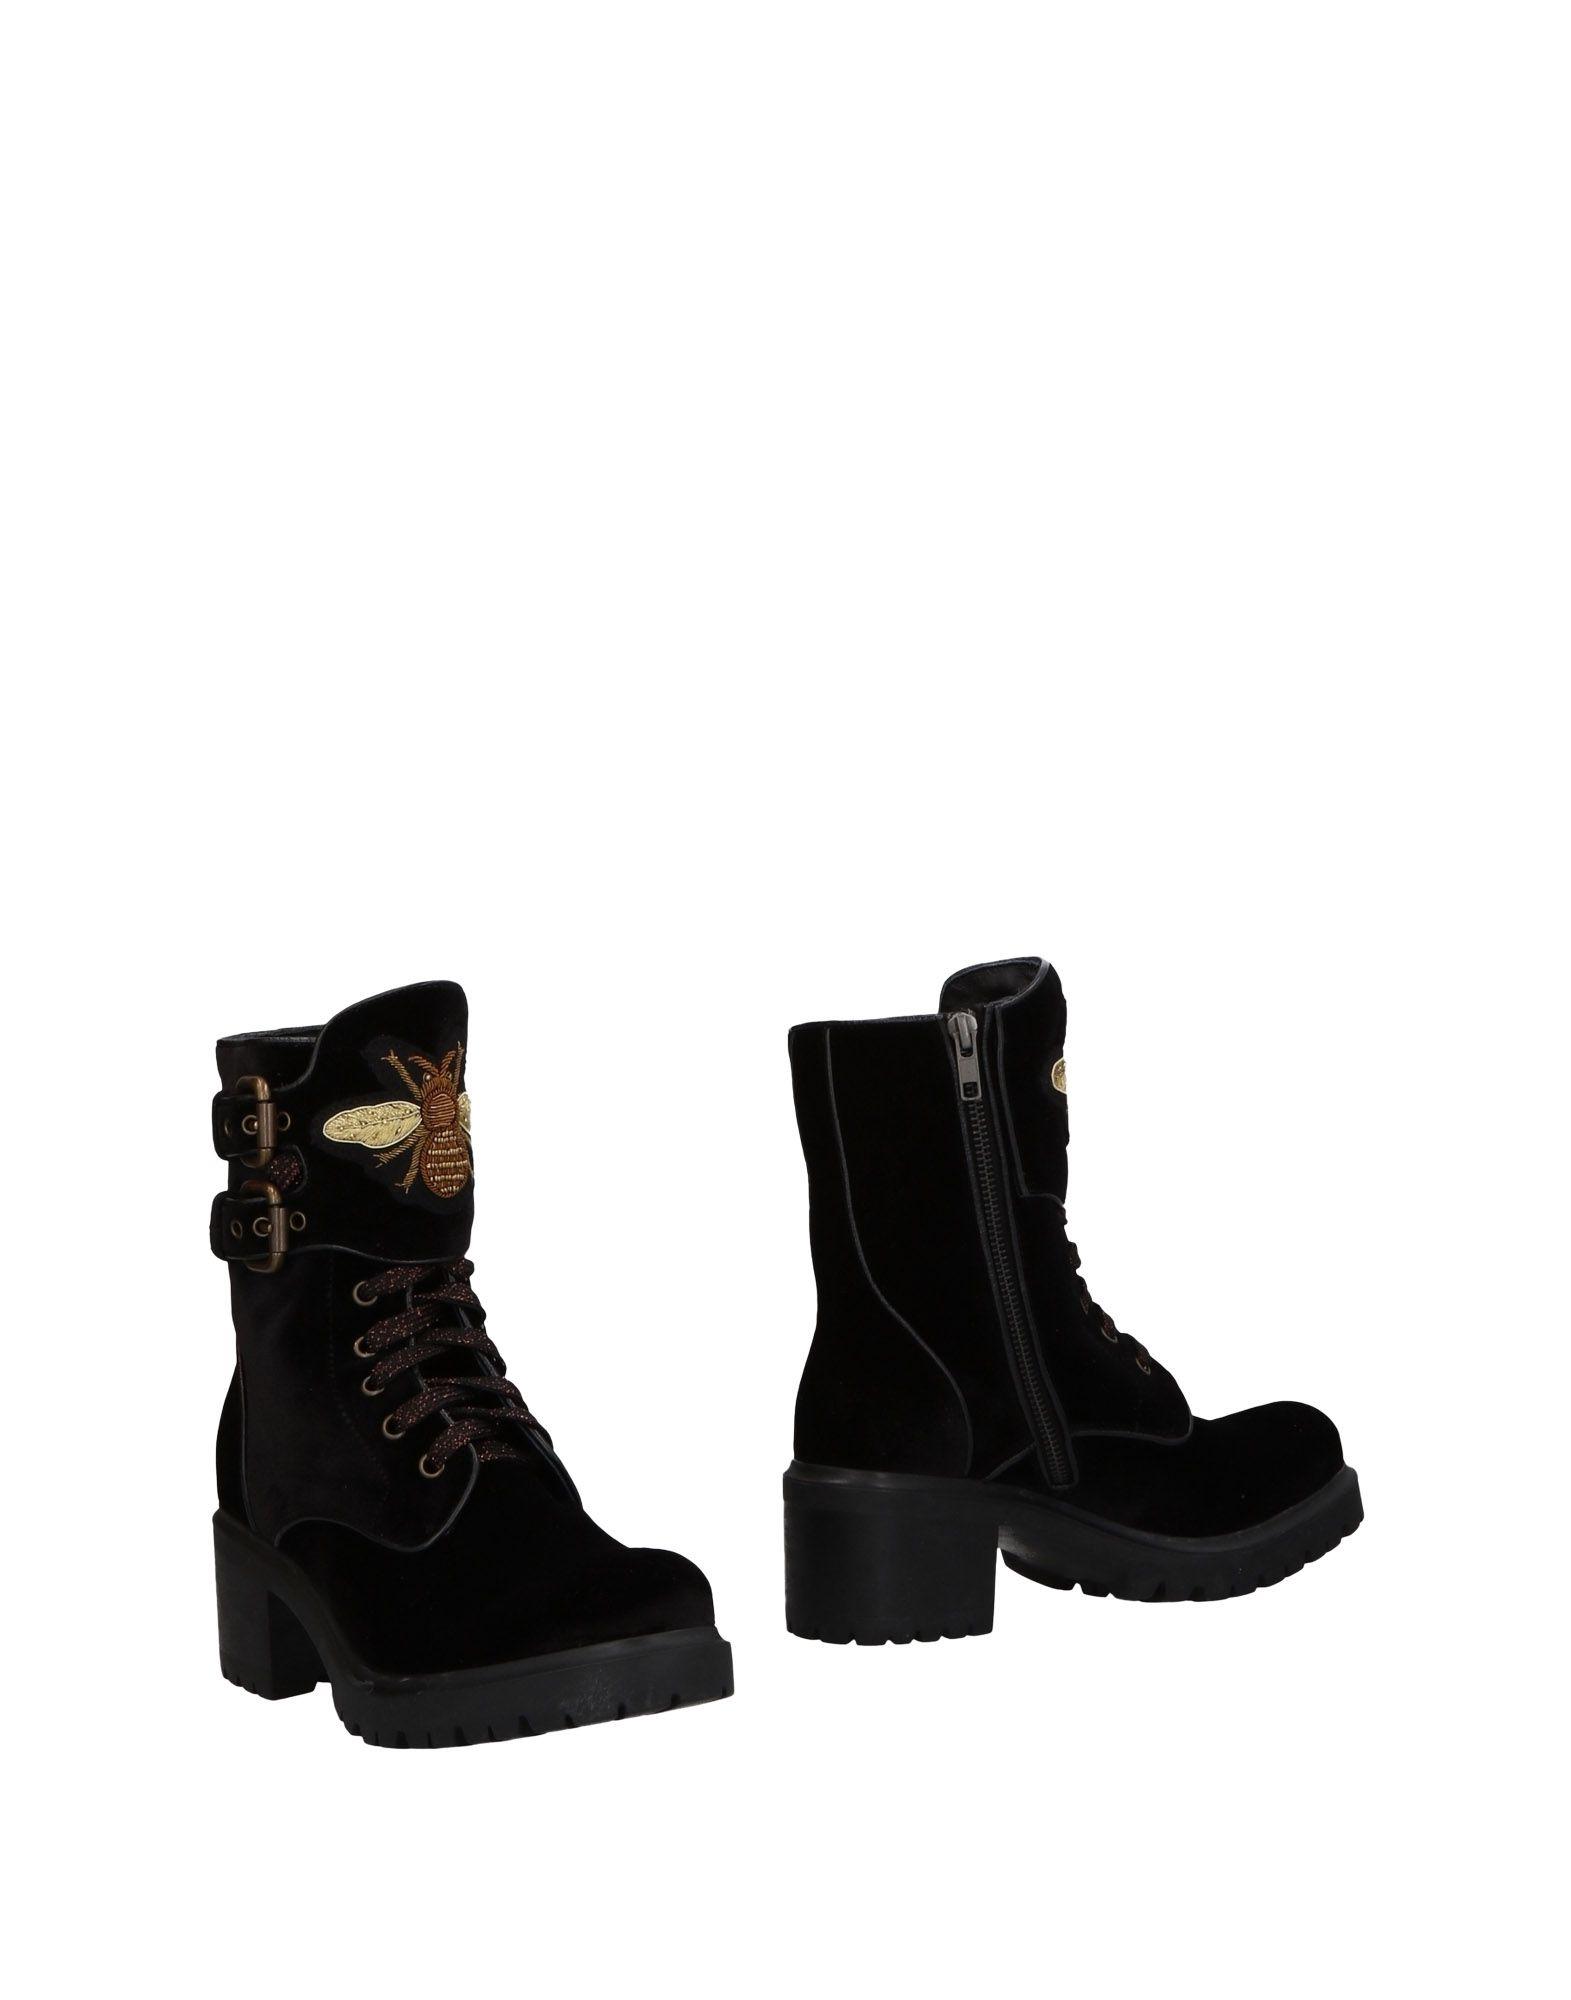 Alexander Hotto Stiefelette Damen aussehende  11474072PVGut aussehende Damen strapazierfähige Schuhe 0e9e7d